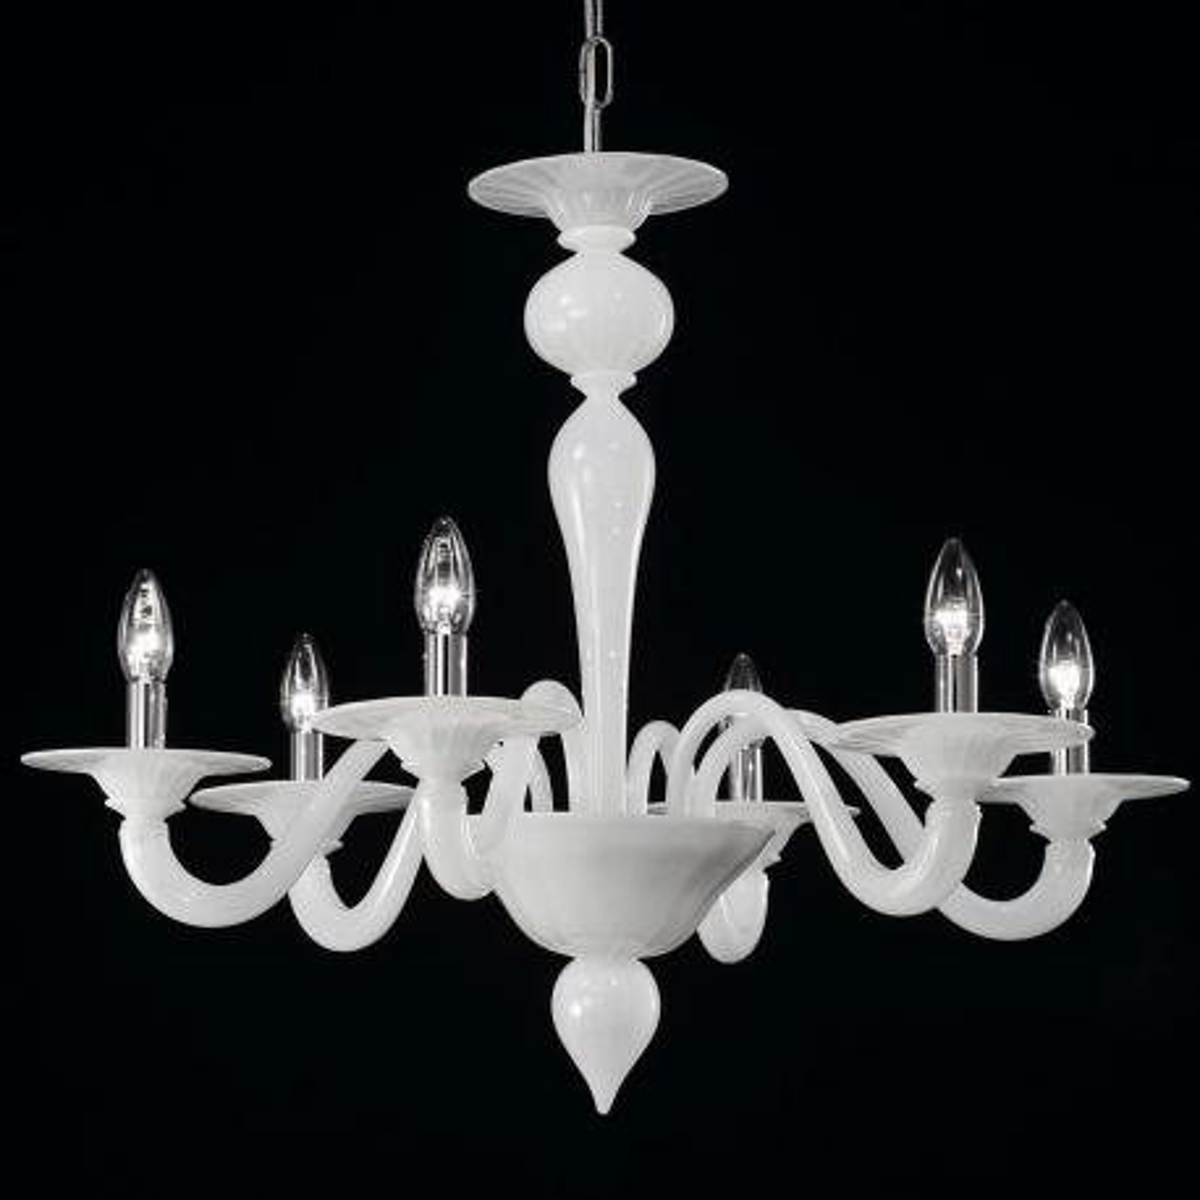 """Serana"" lustre en cristal de Murano - 6 lumières - blanc"